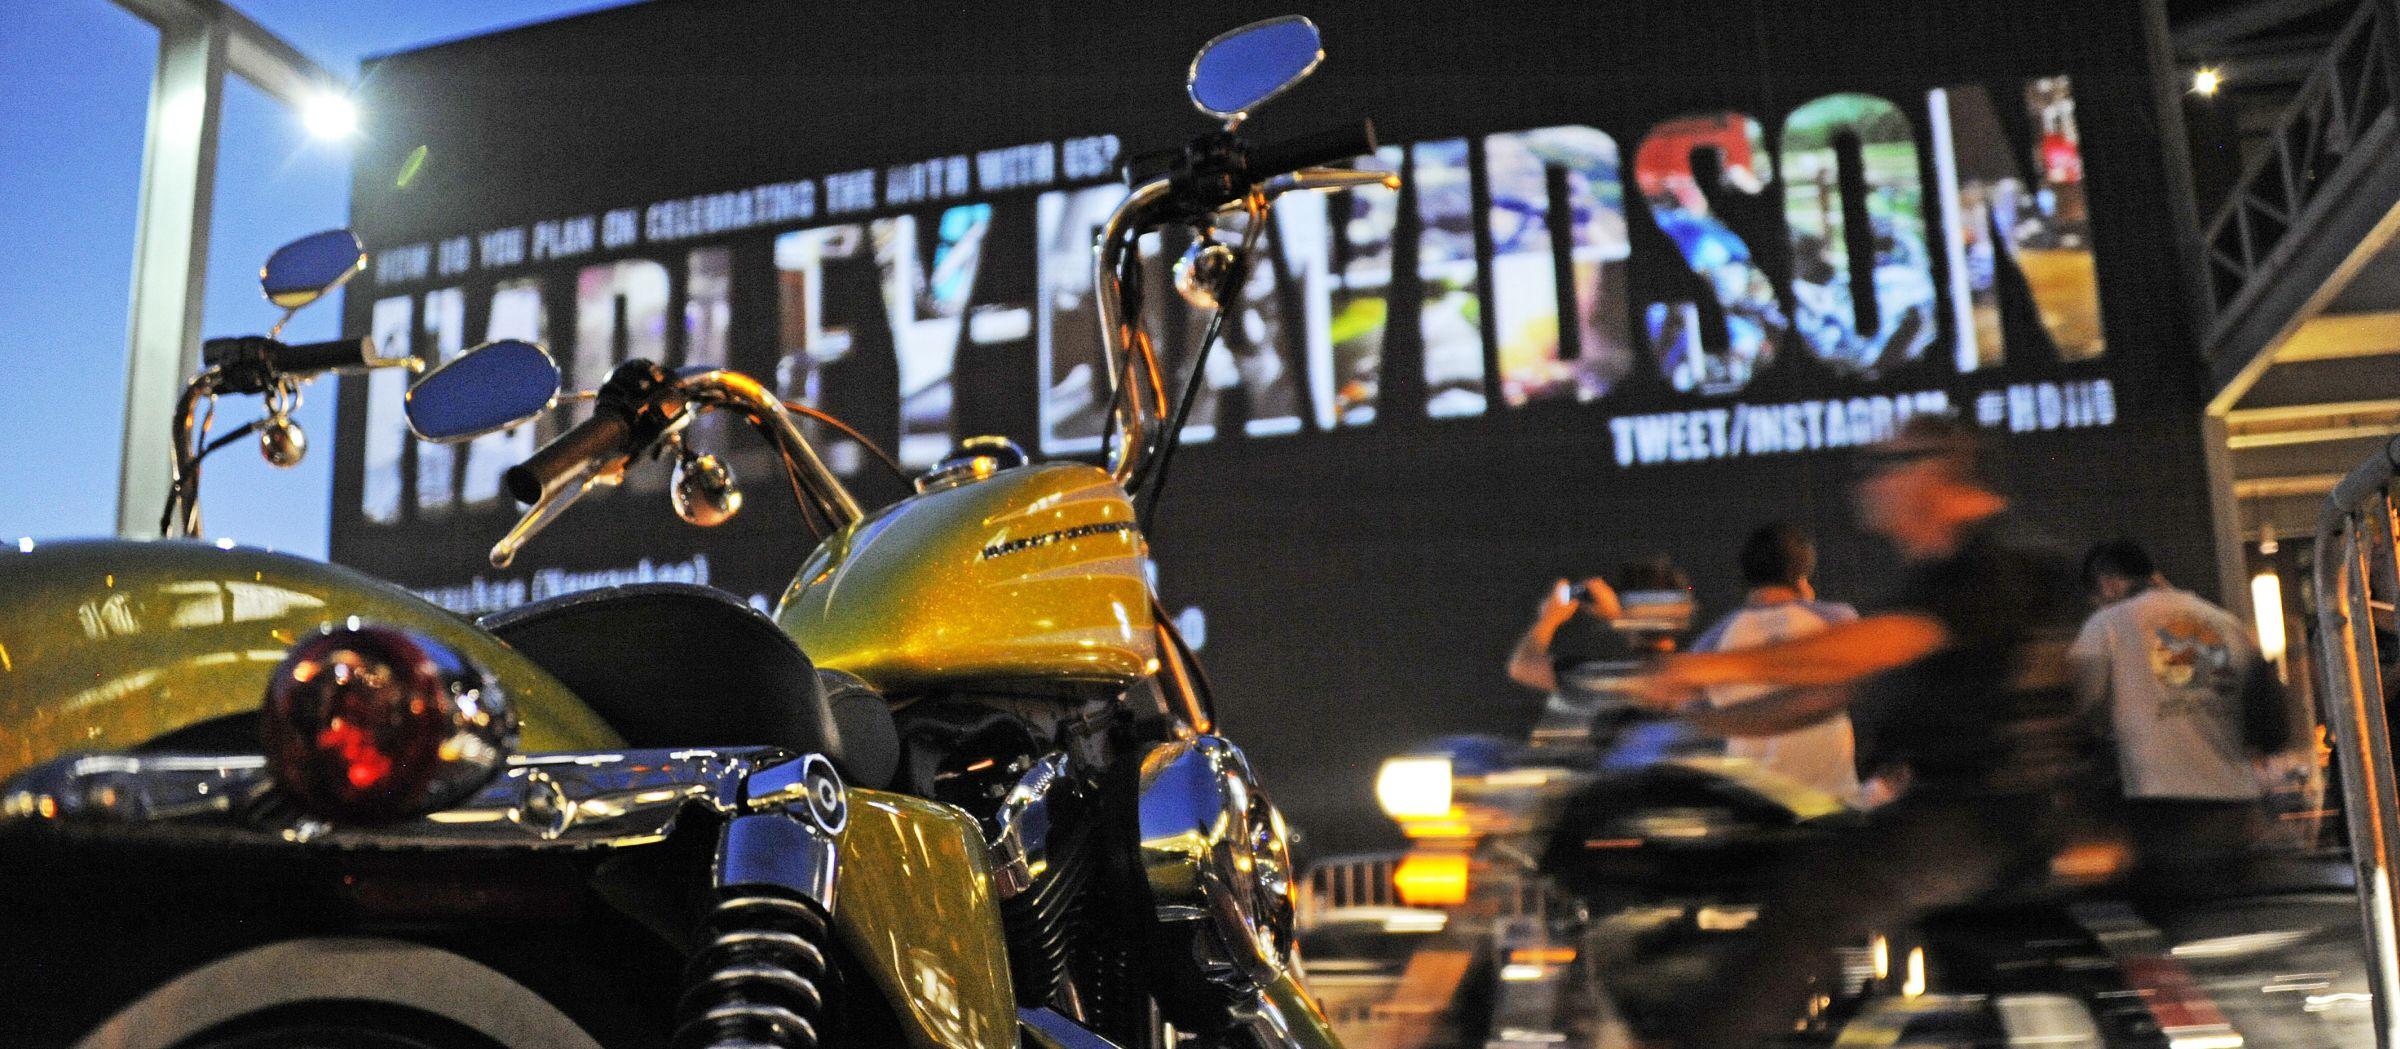 Ausstellung im Harley Davidson Motor Company Museum in Milwaukee in Wisconsin